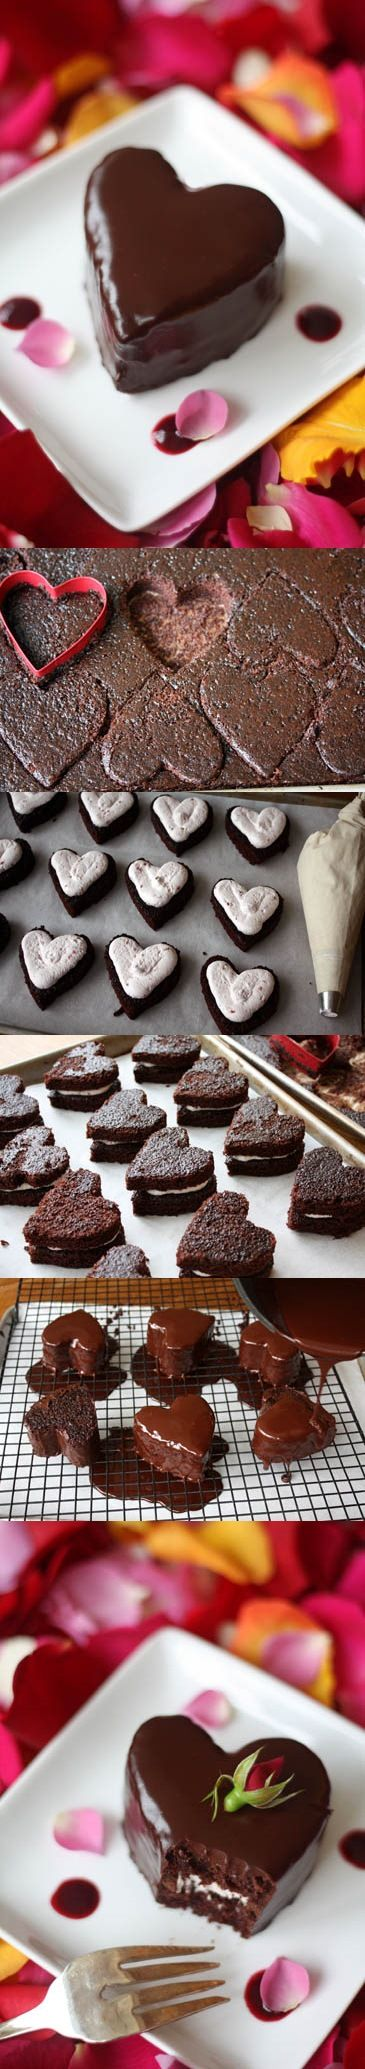 ideia dia dos namorados Chocolate Valentines Day Cake: